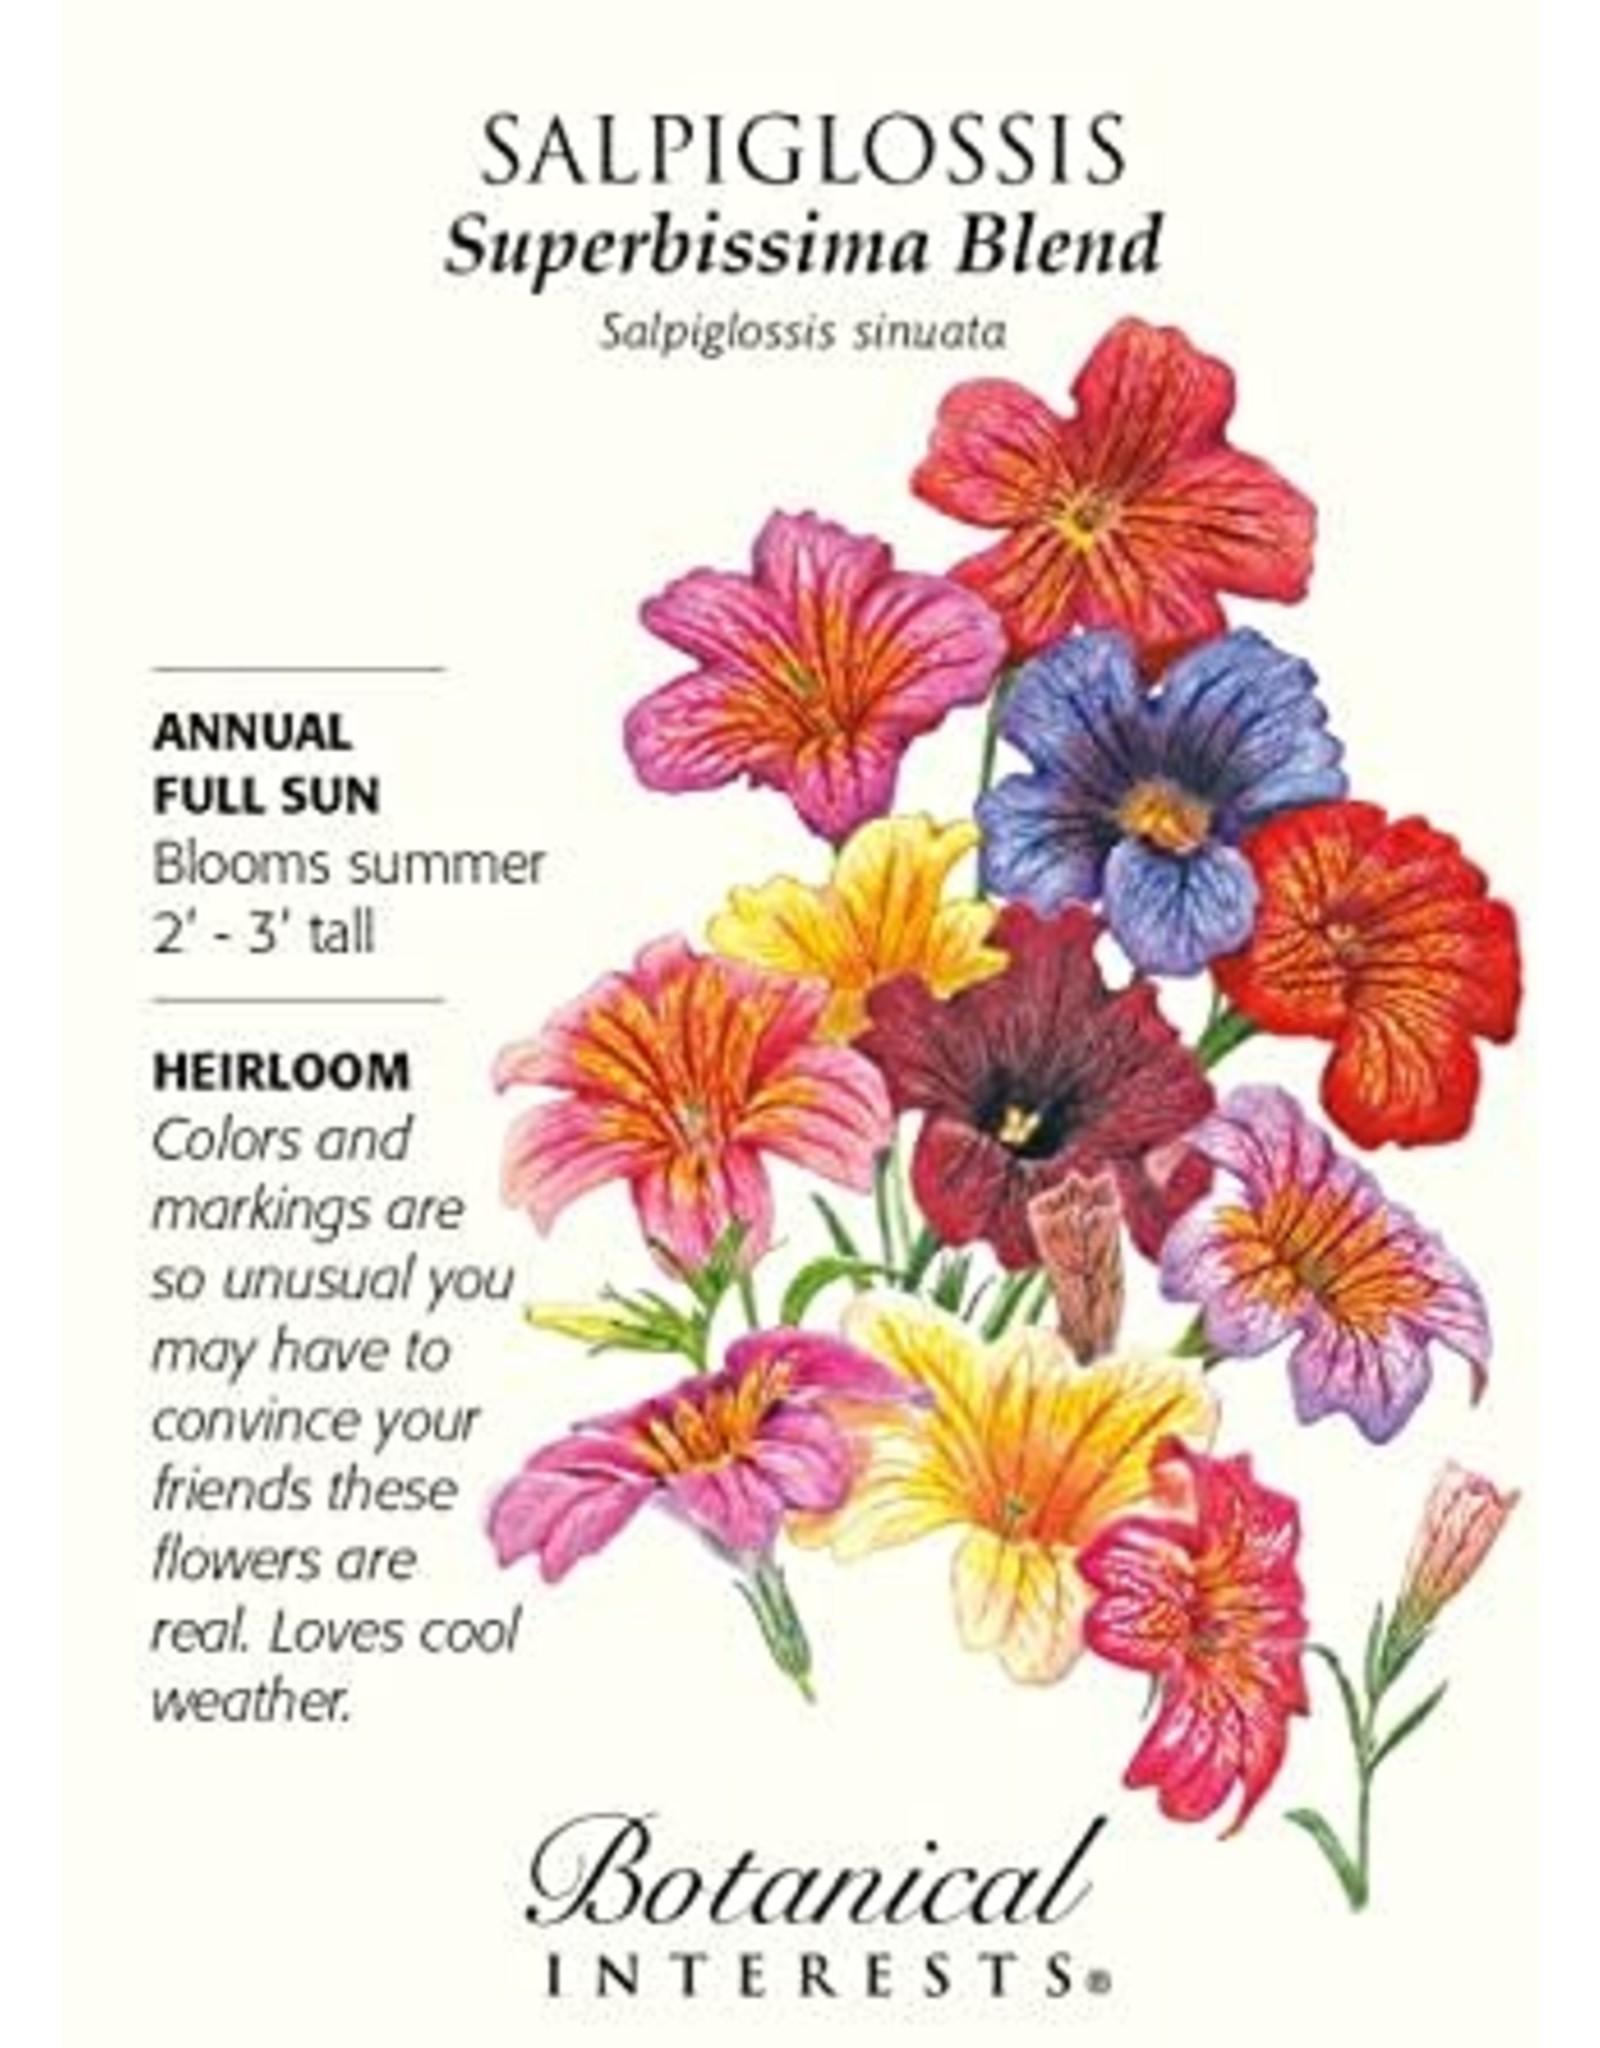 Seeds - Salpiglossis Superbissima Blend